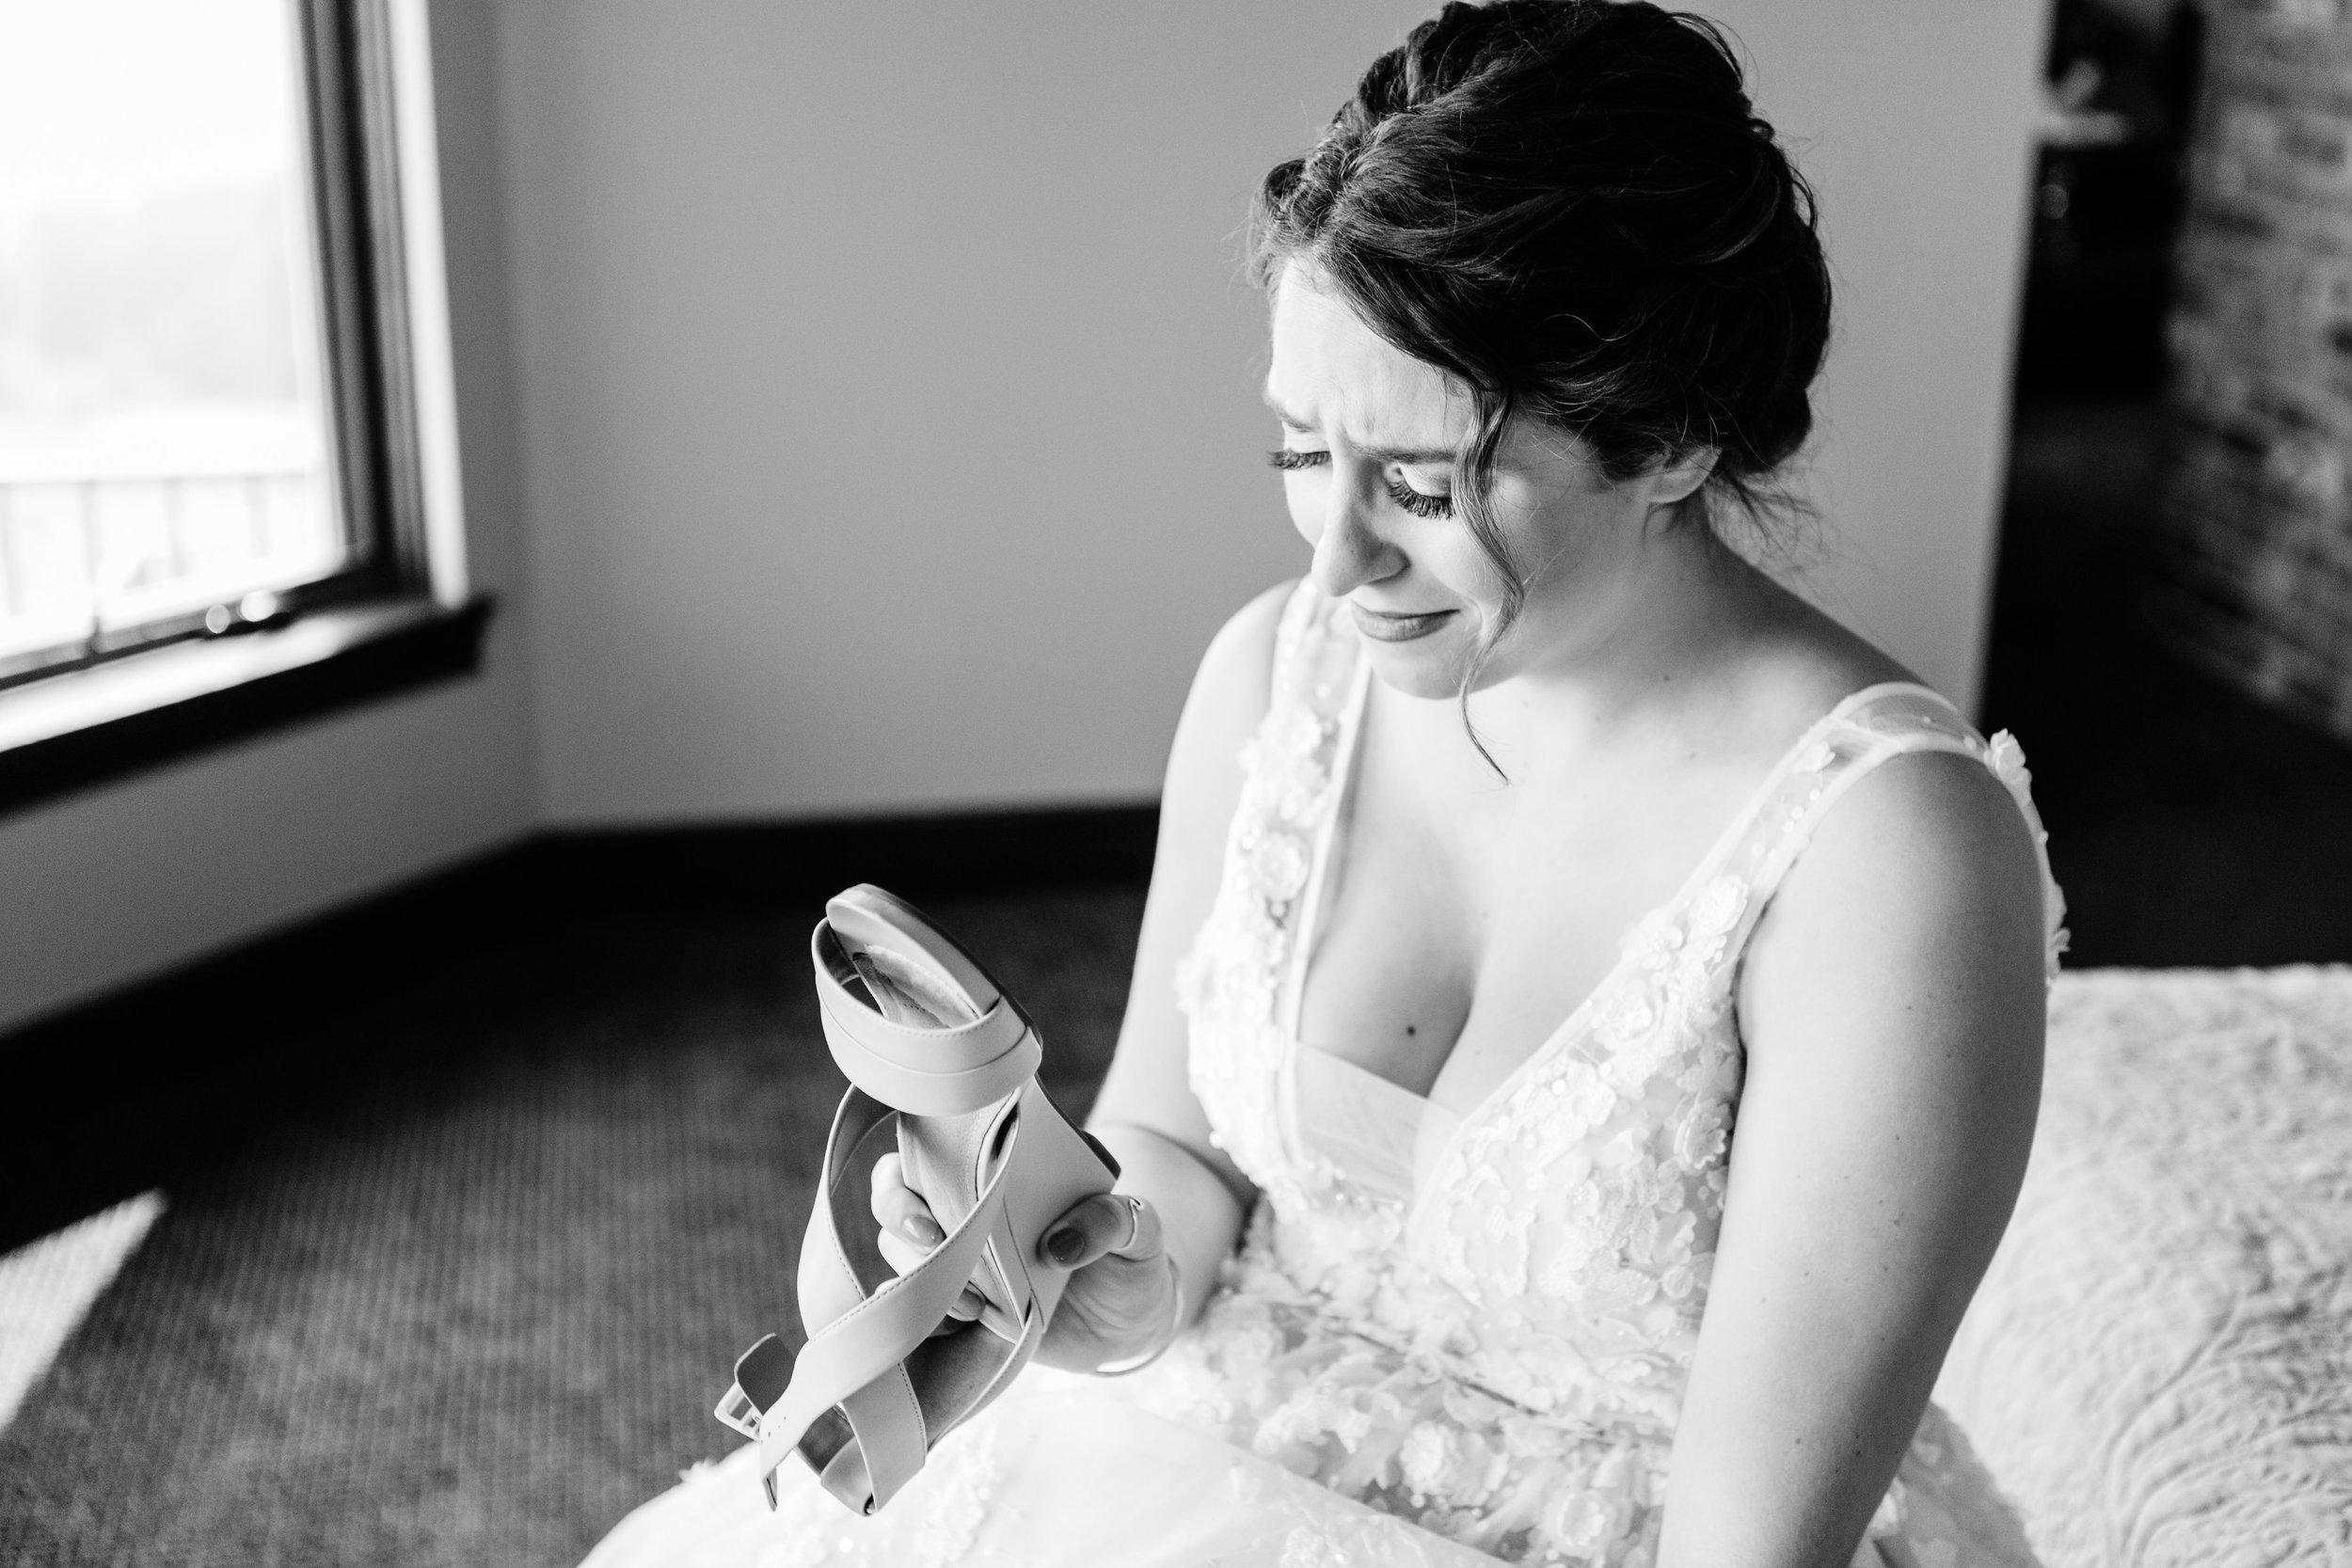 Marcie&SethMarriedSneakPeeks-LauraPedrinoPhotographer-21.jpg